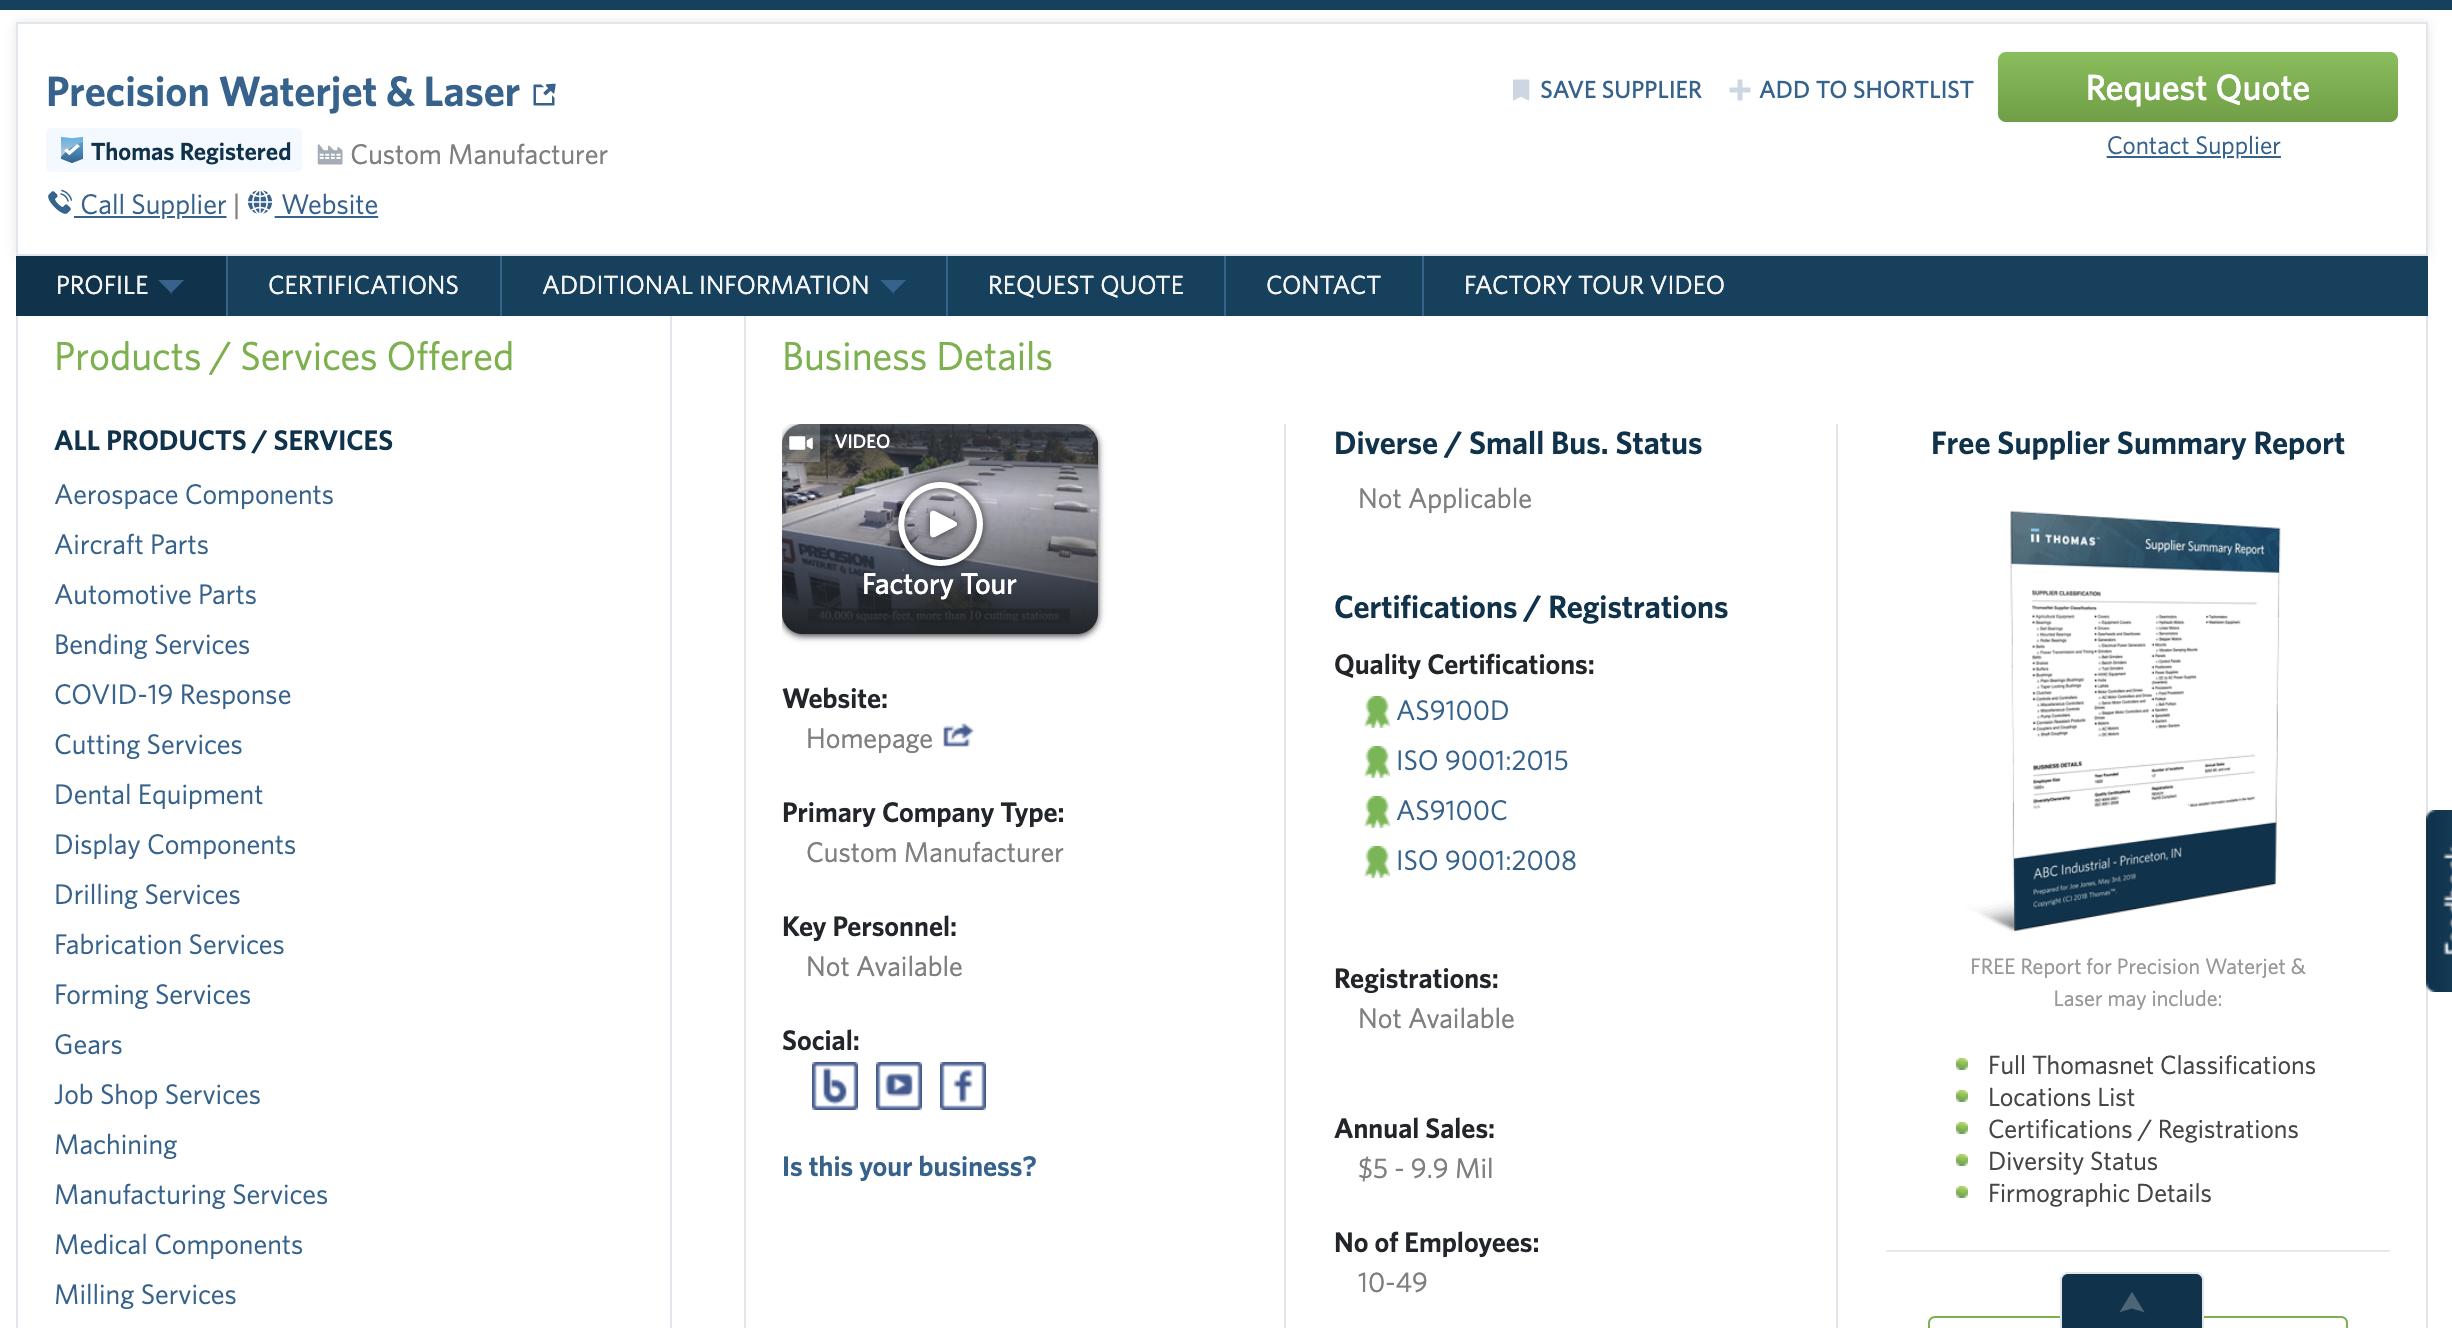 Precision Waterjet & Laser Thomasnet.com company profile